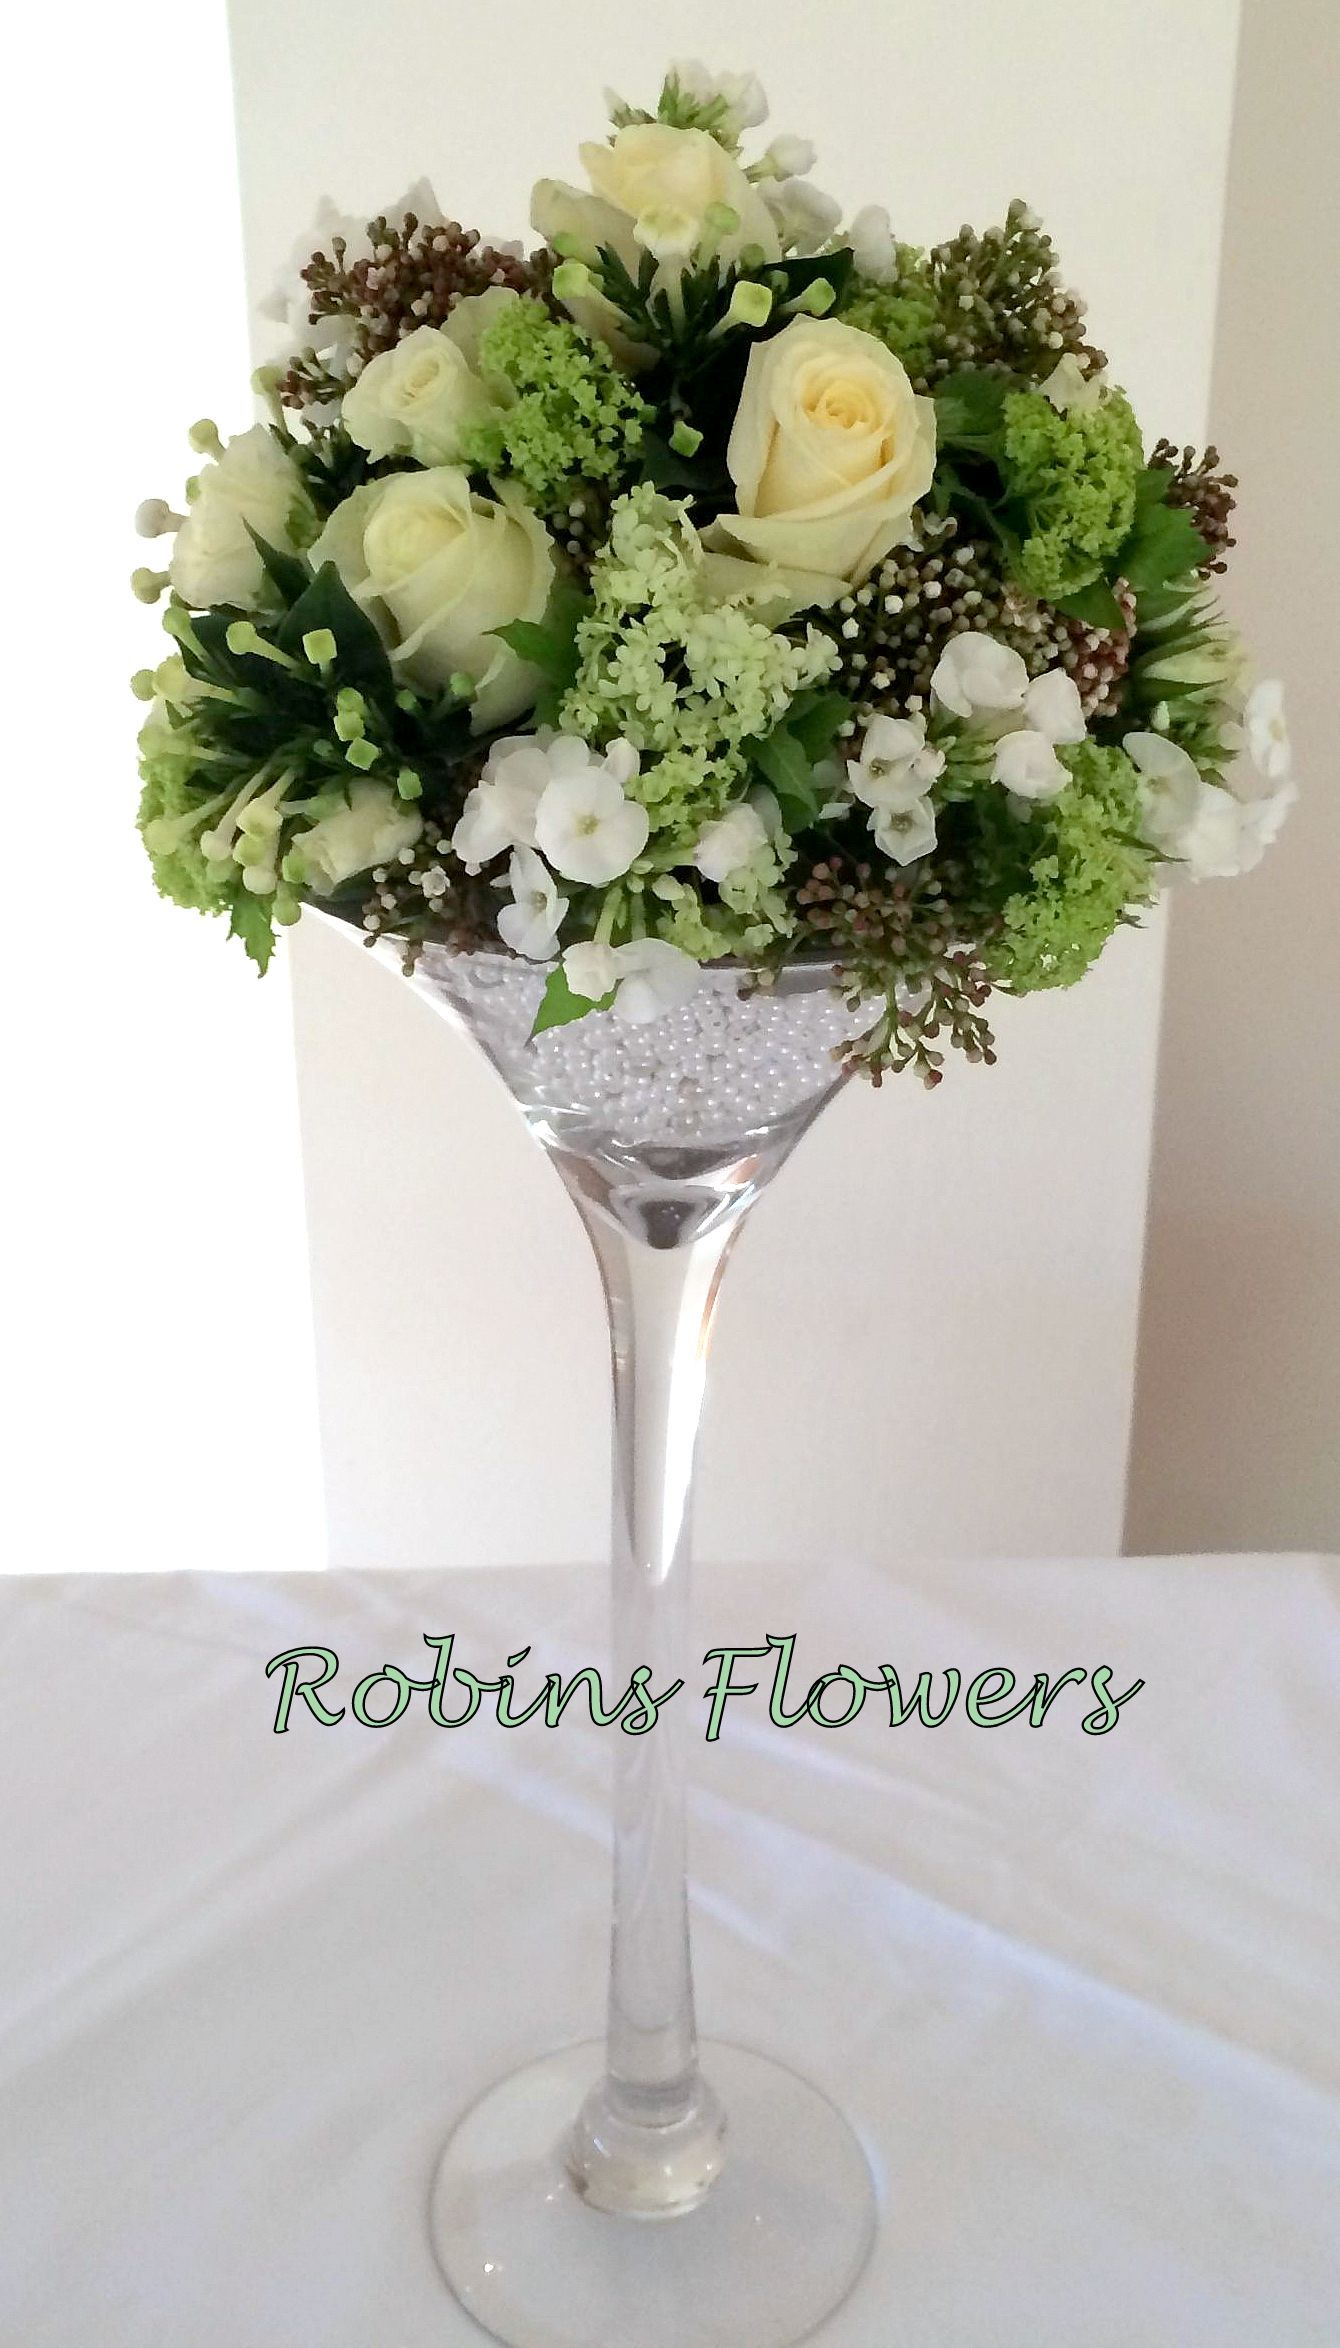 Martini Vase for Weddings | Decorations | Pinterest | Weddings ...